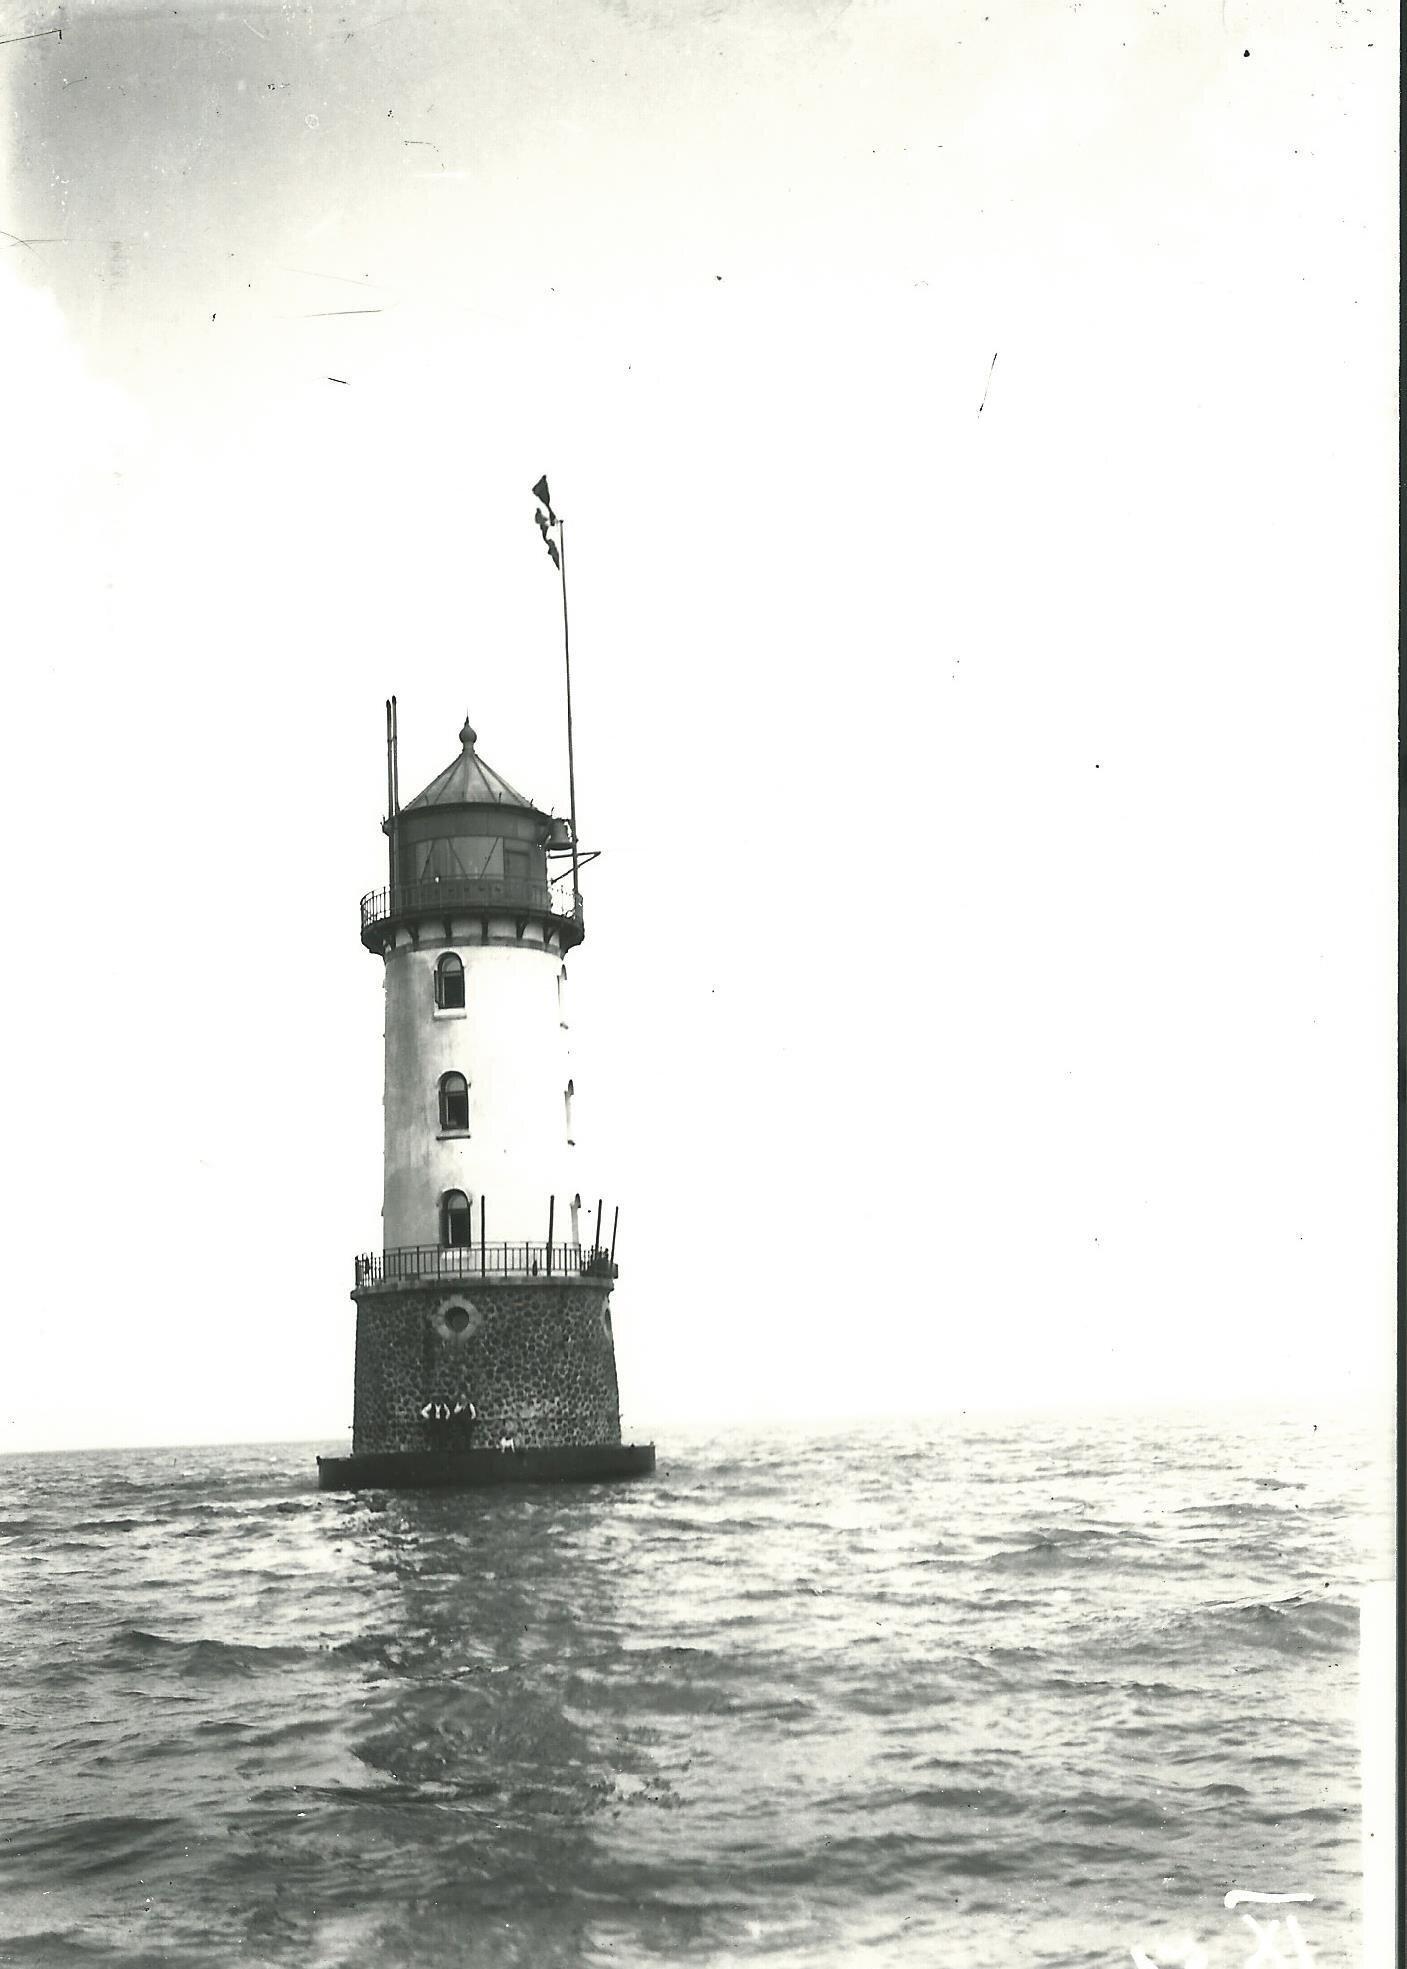 Meyerslegde 1905